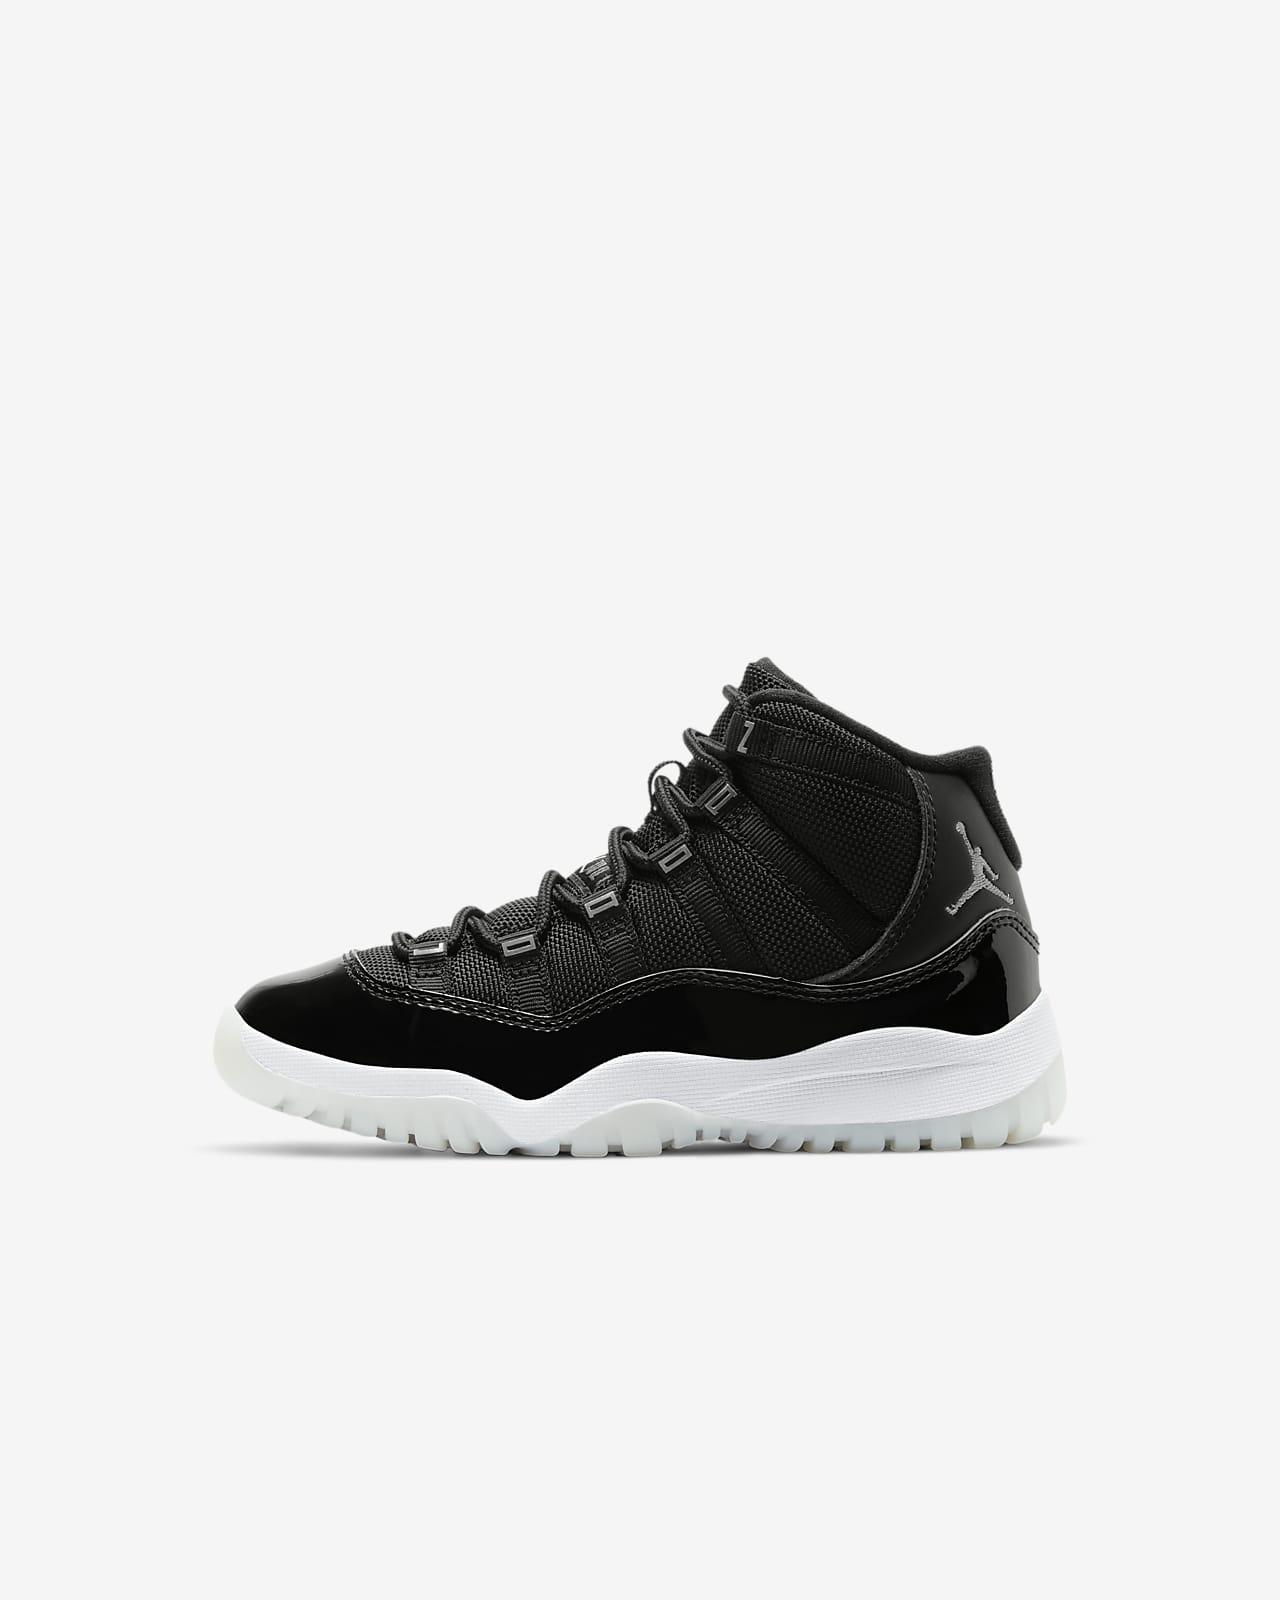 Air Jordan 11 Retro 3/4 Younger Kids' Shoe